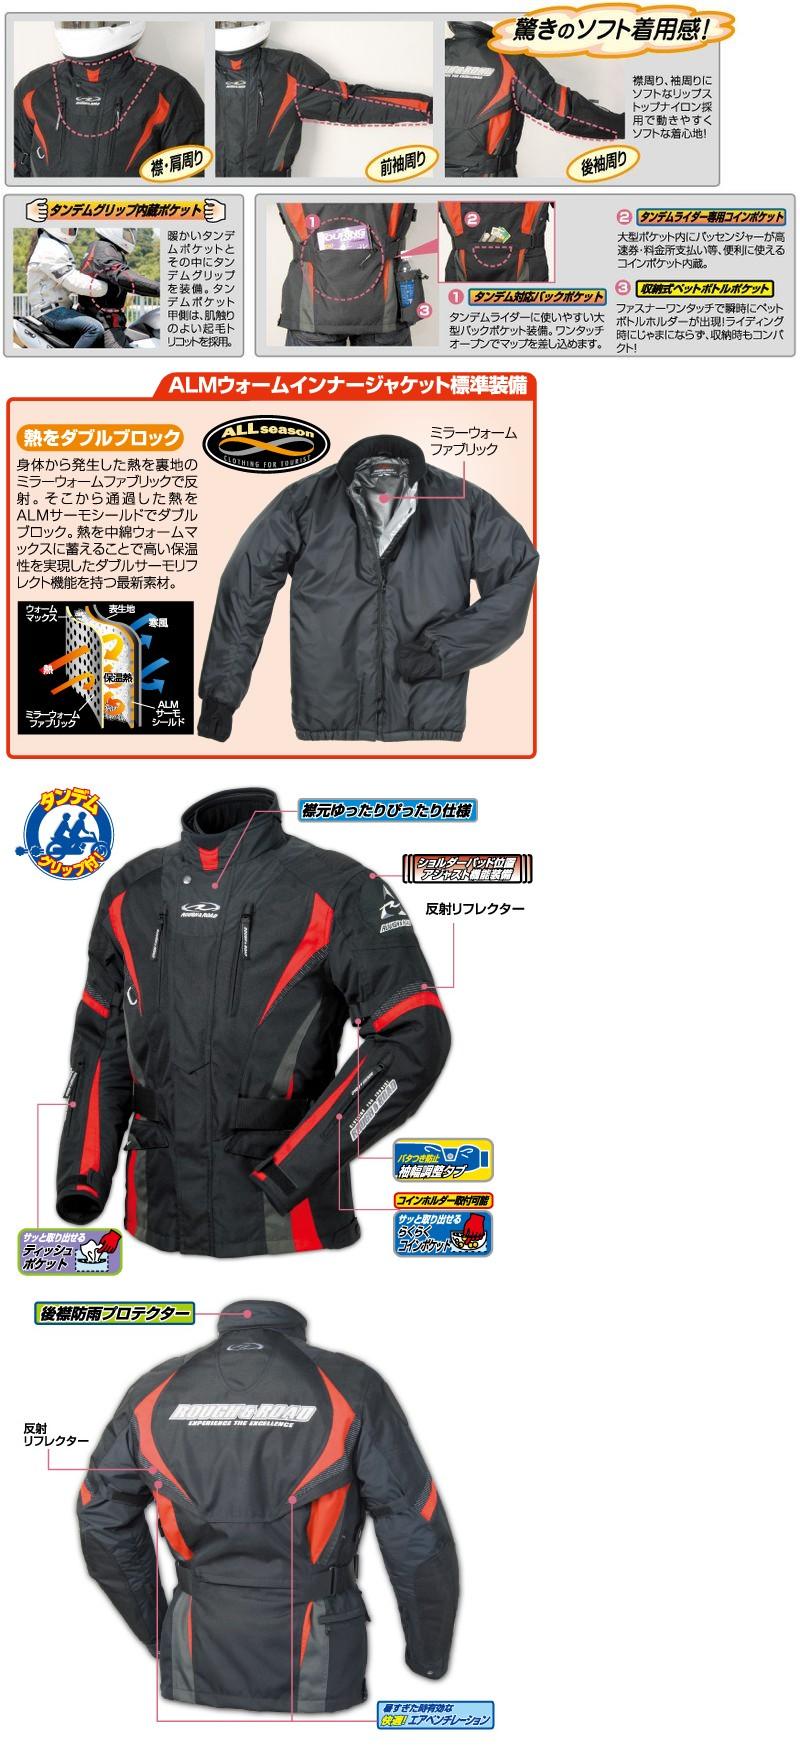 【ROUGH&ROAD】Water shield硬式冬季外套FP - 「Webike-摩托百貨」